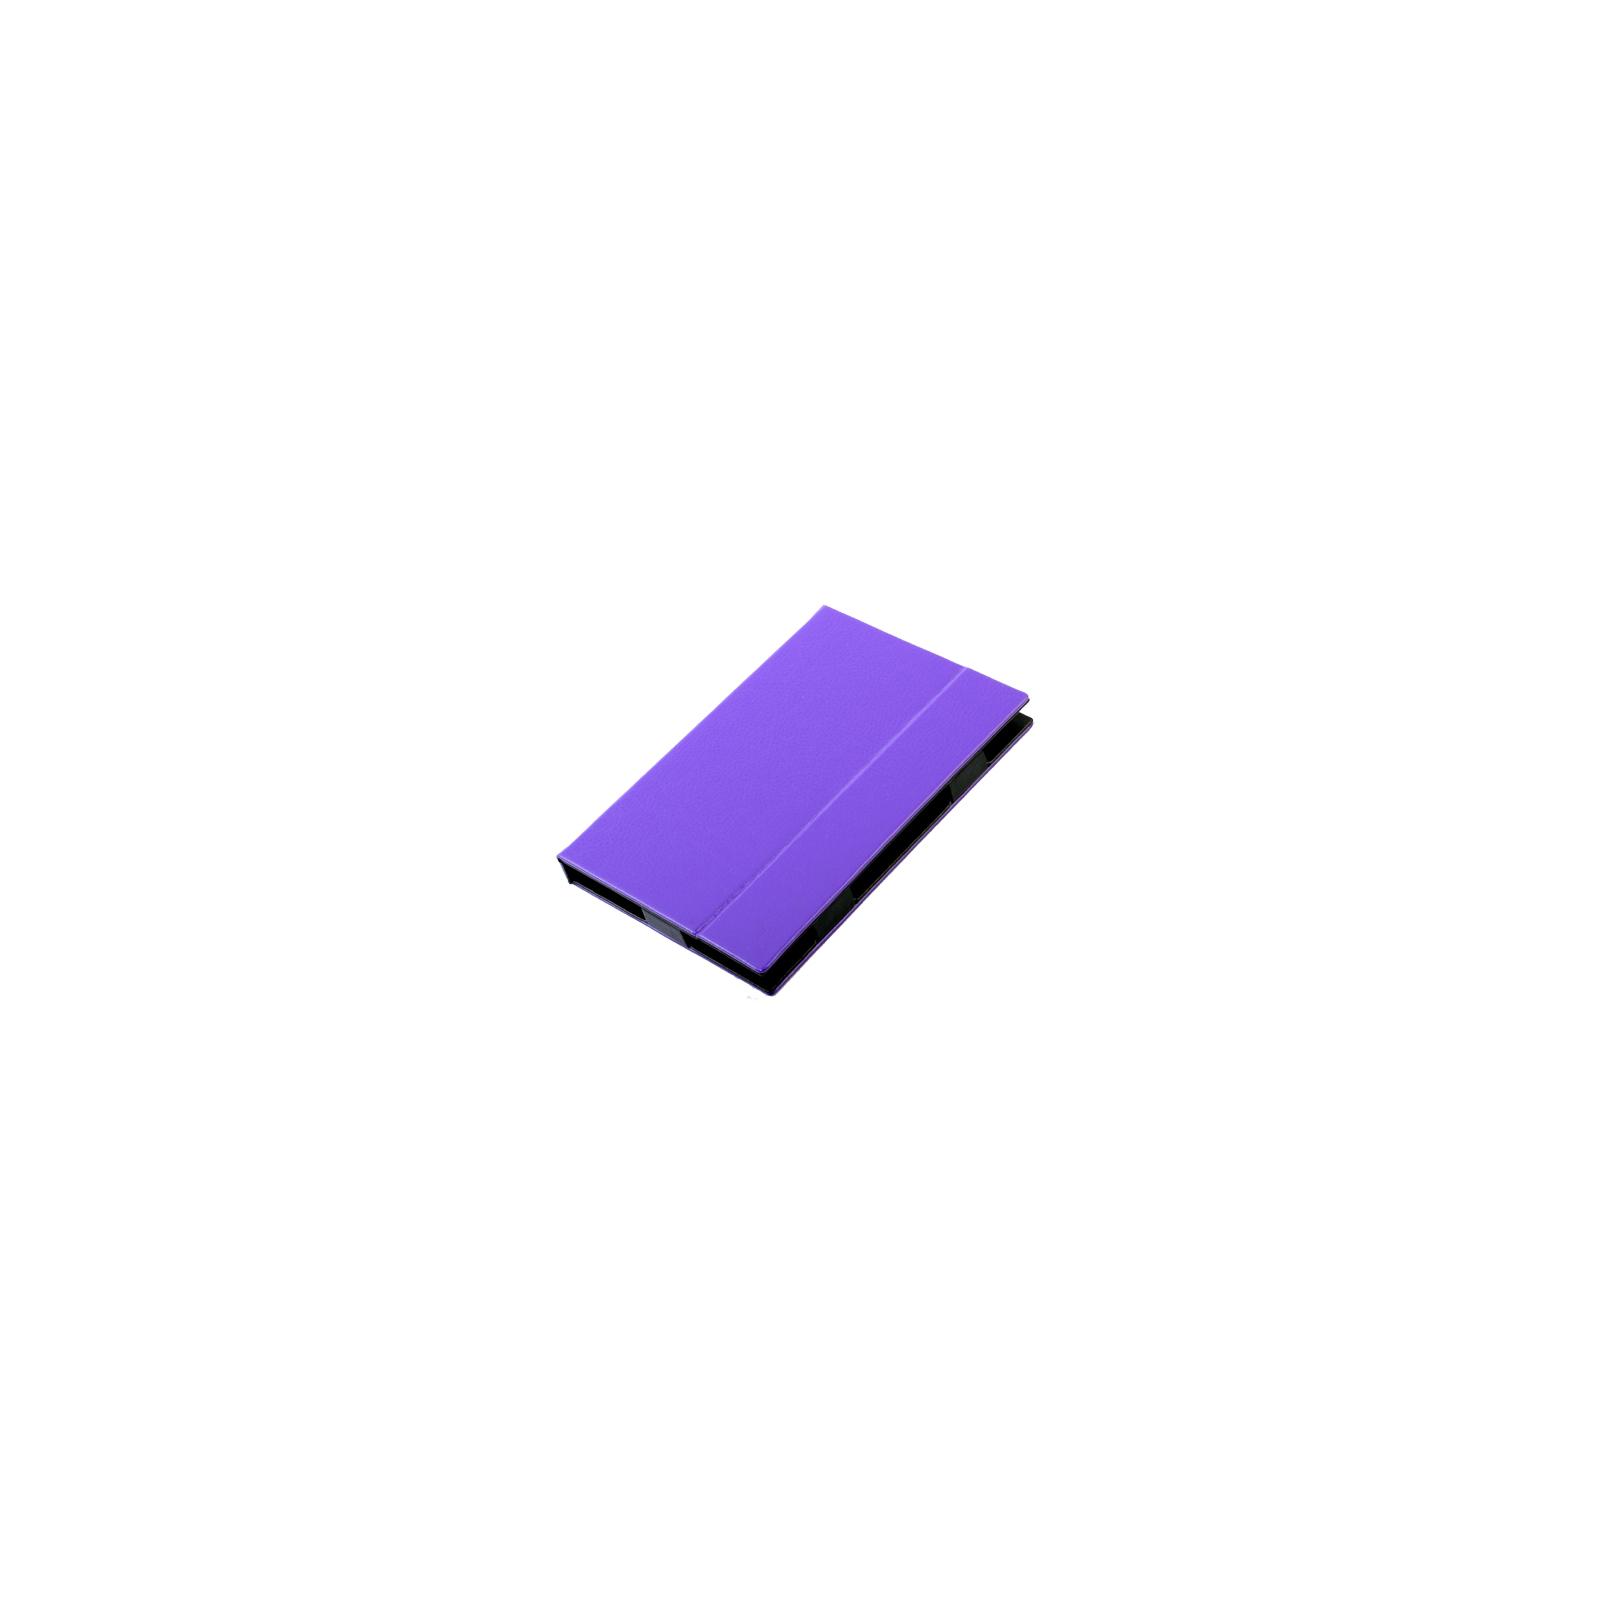 Чехол для планшета Vento 10.1 Desire Bright - purple